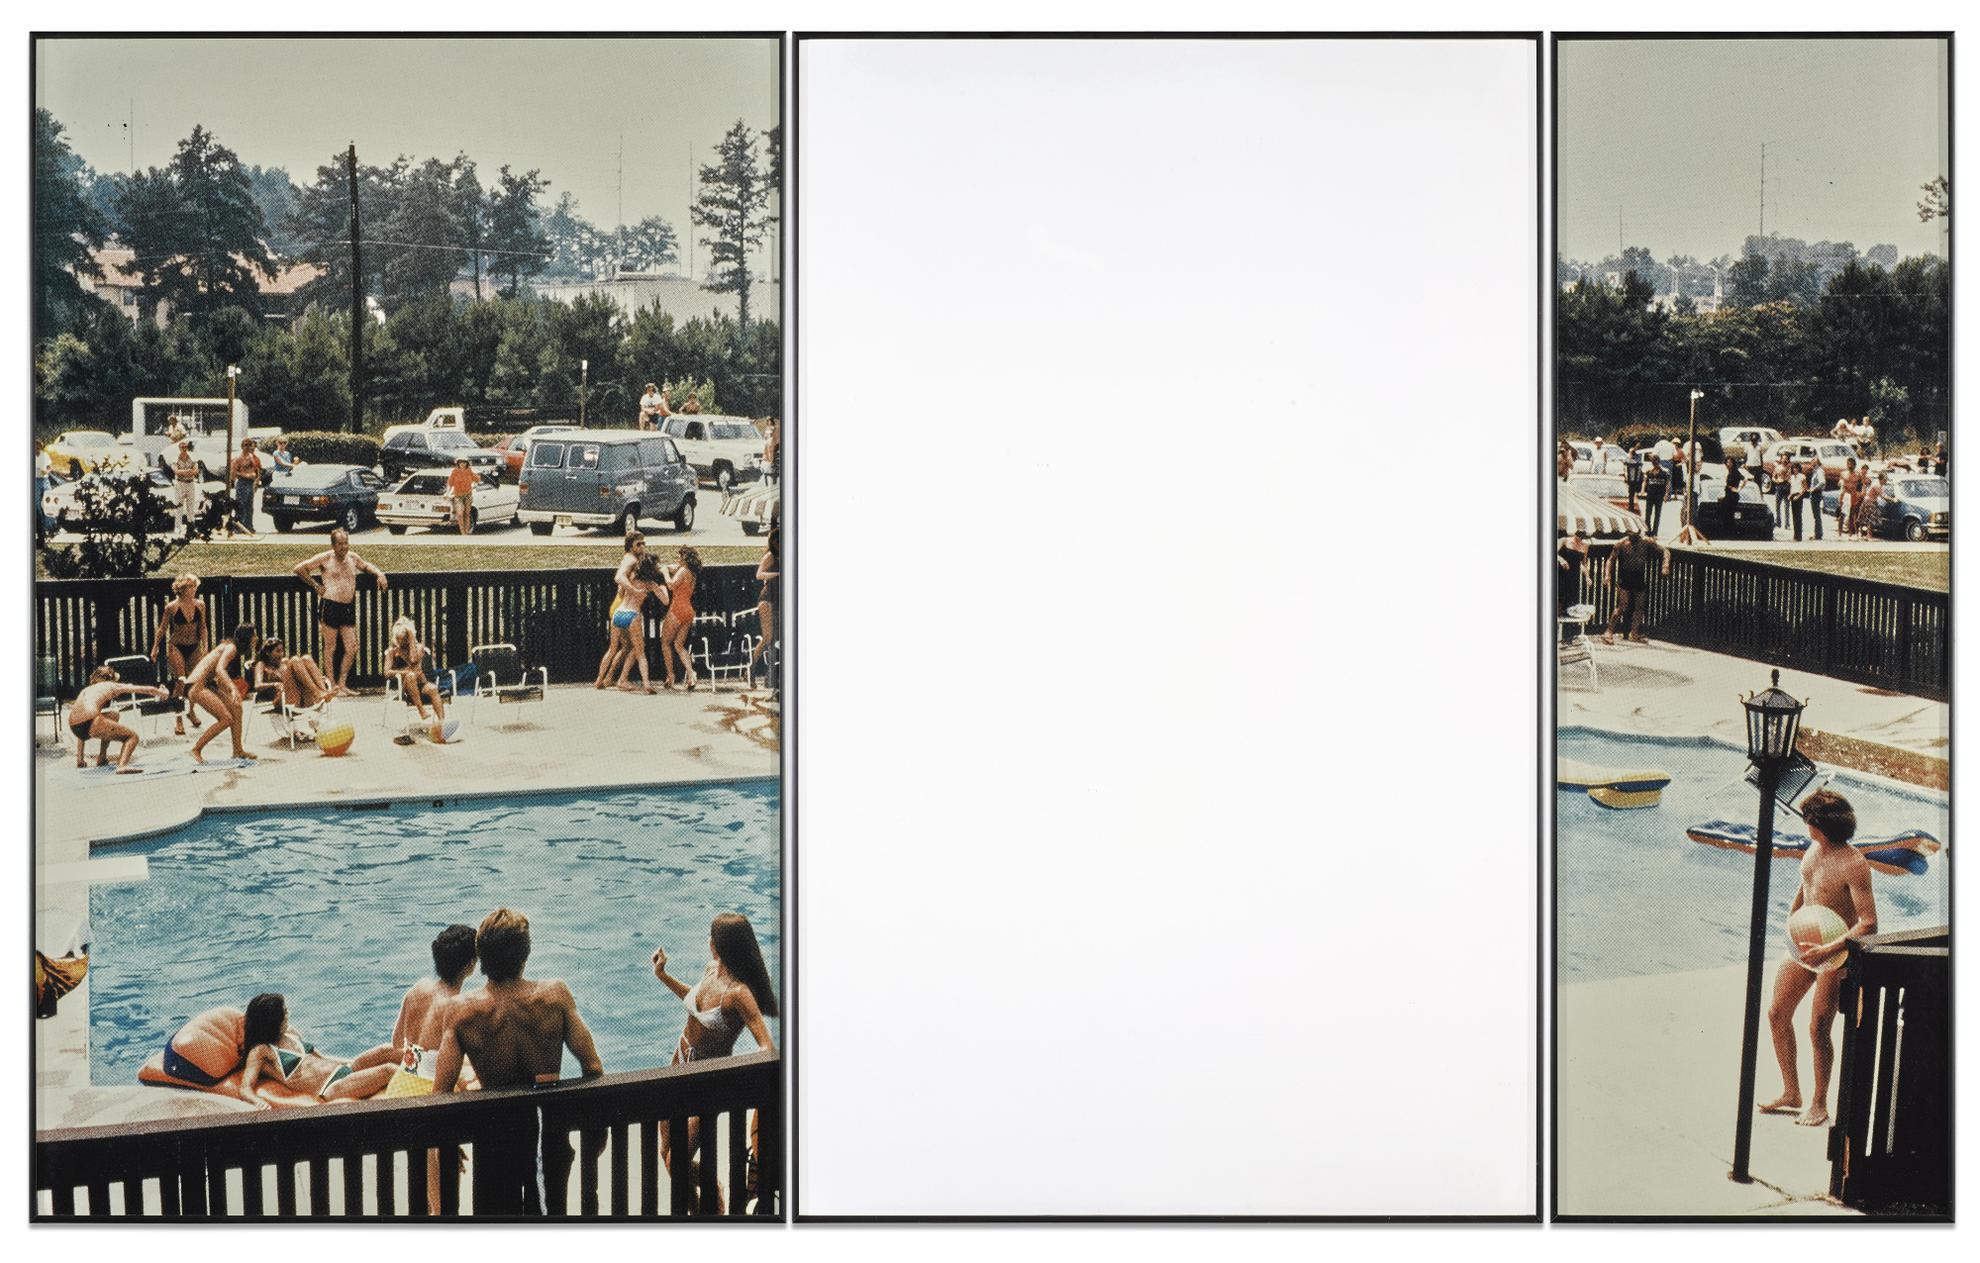 John Baldessari-Hidden (With Onlookers And Swimming Pool)-1990